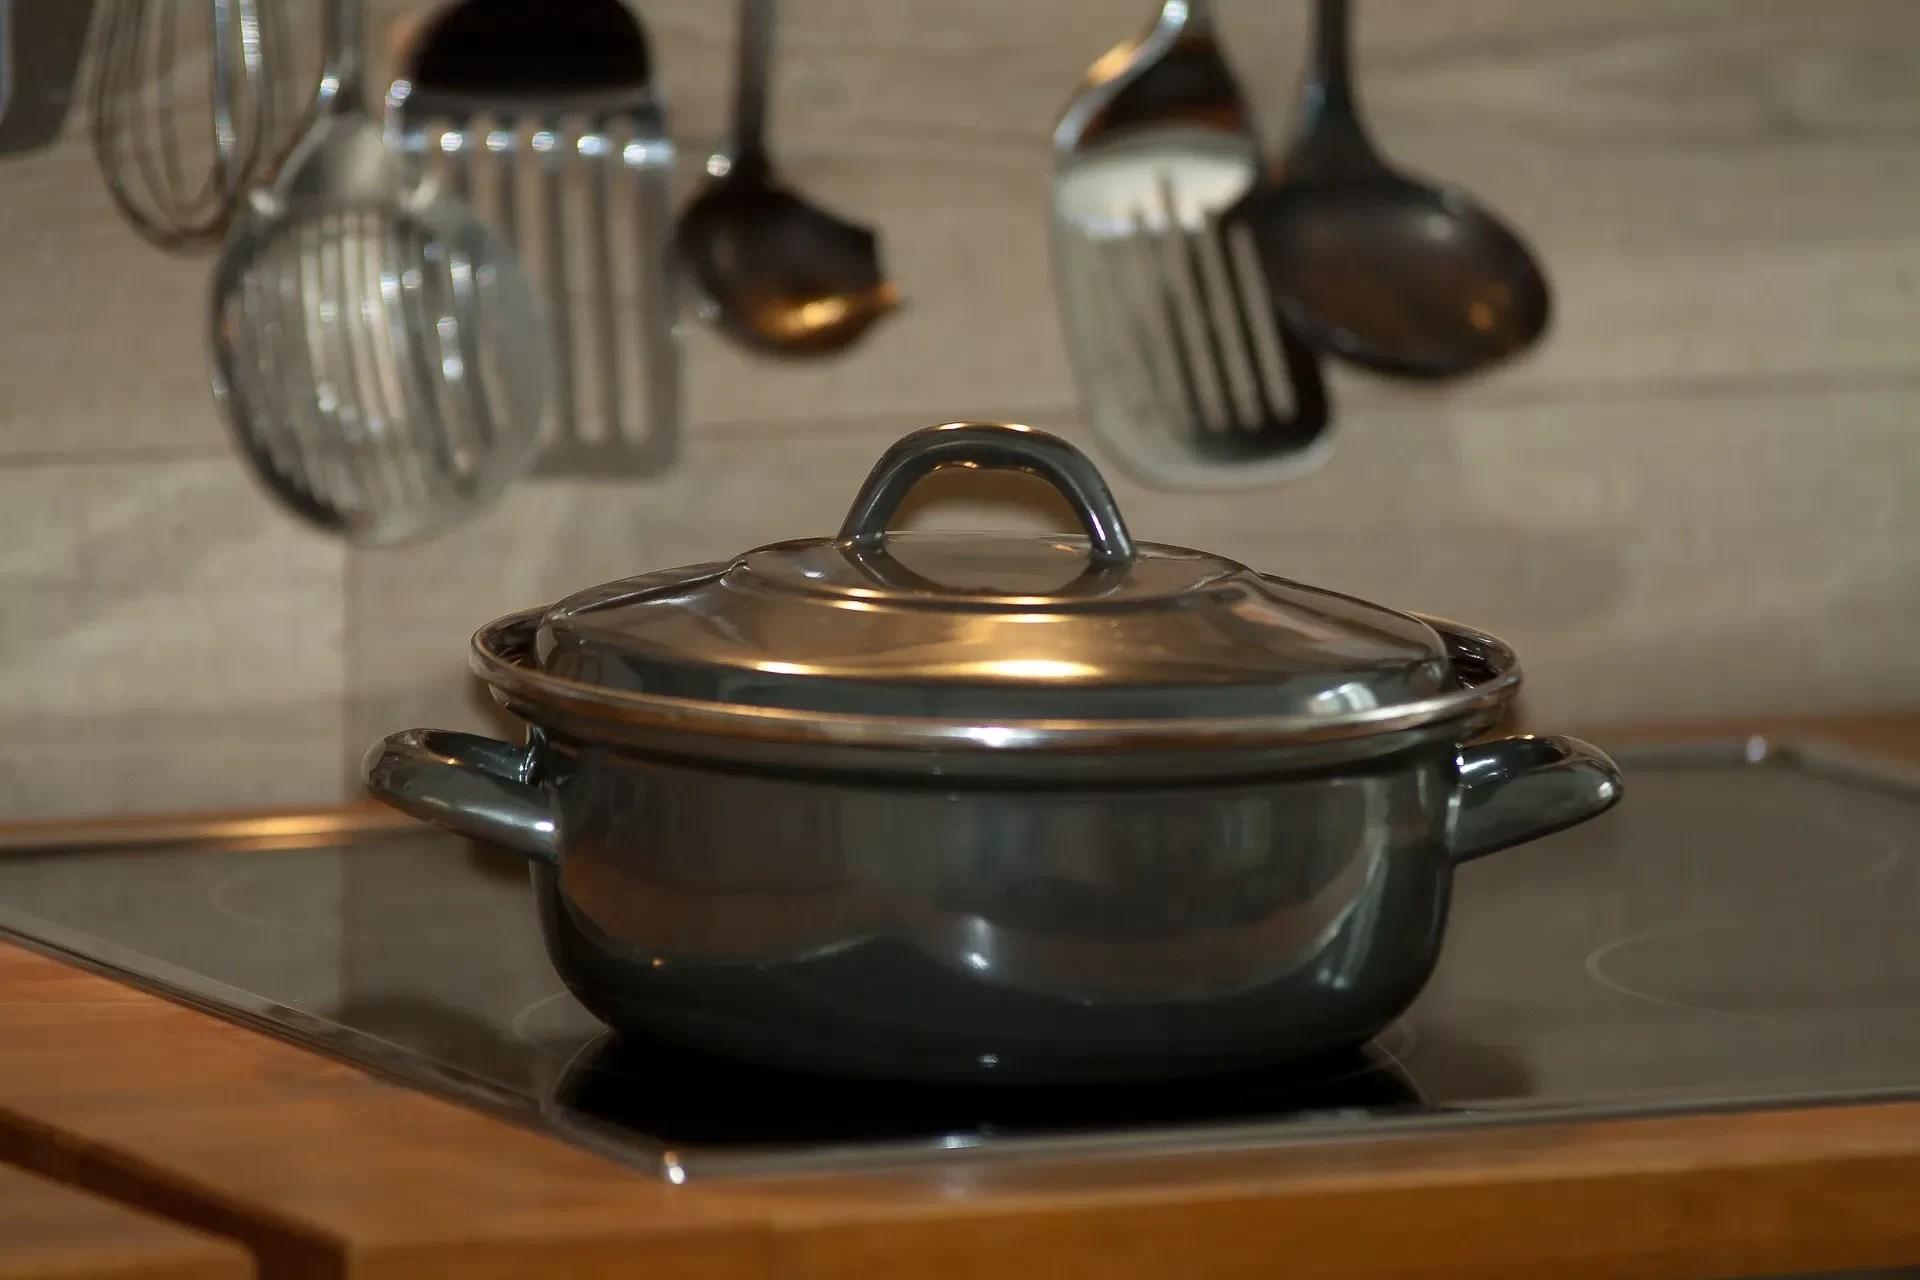 cook-750142_1920